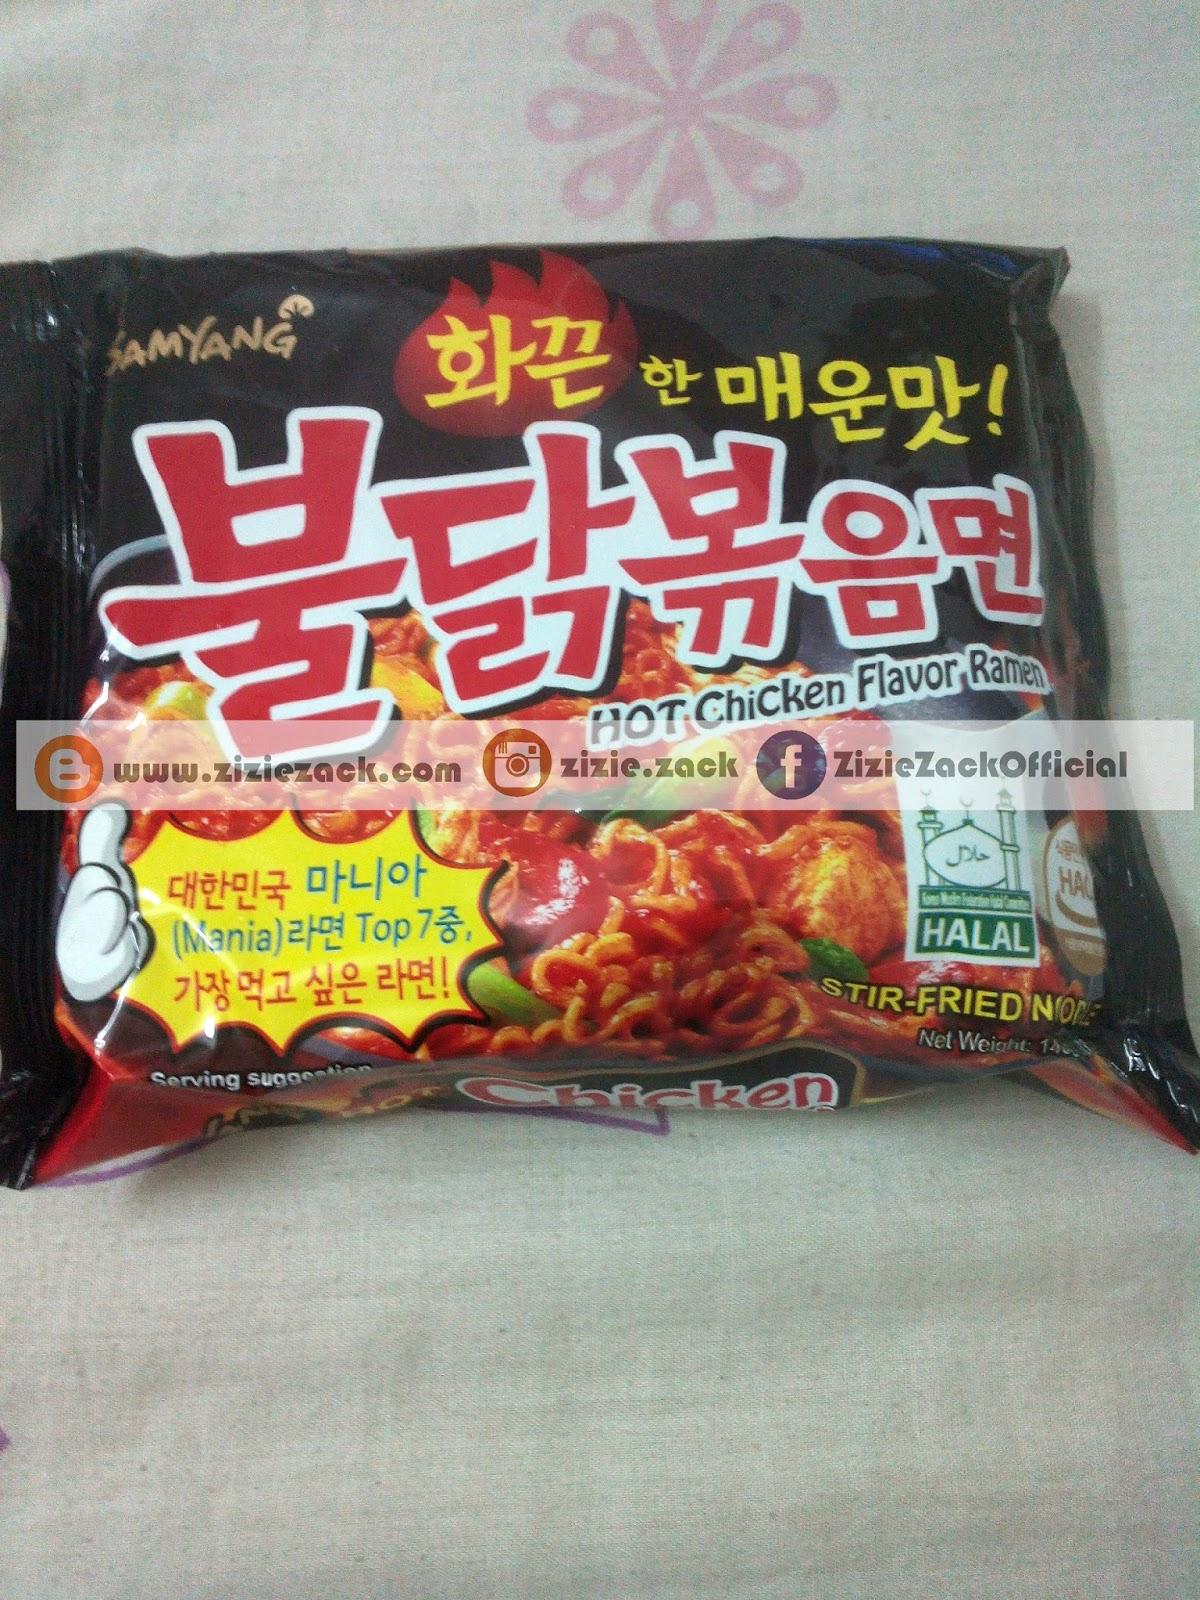 Moreh Bersama Sama Samyang Hot Chicken Flavor Ramen Spicy Korea Ramen